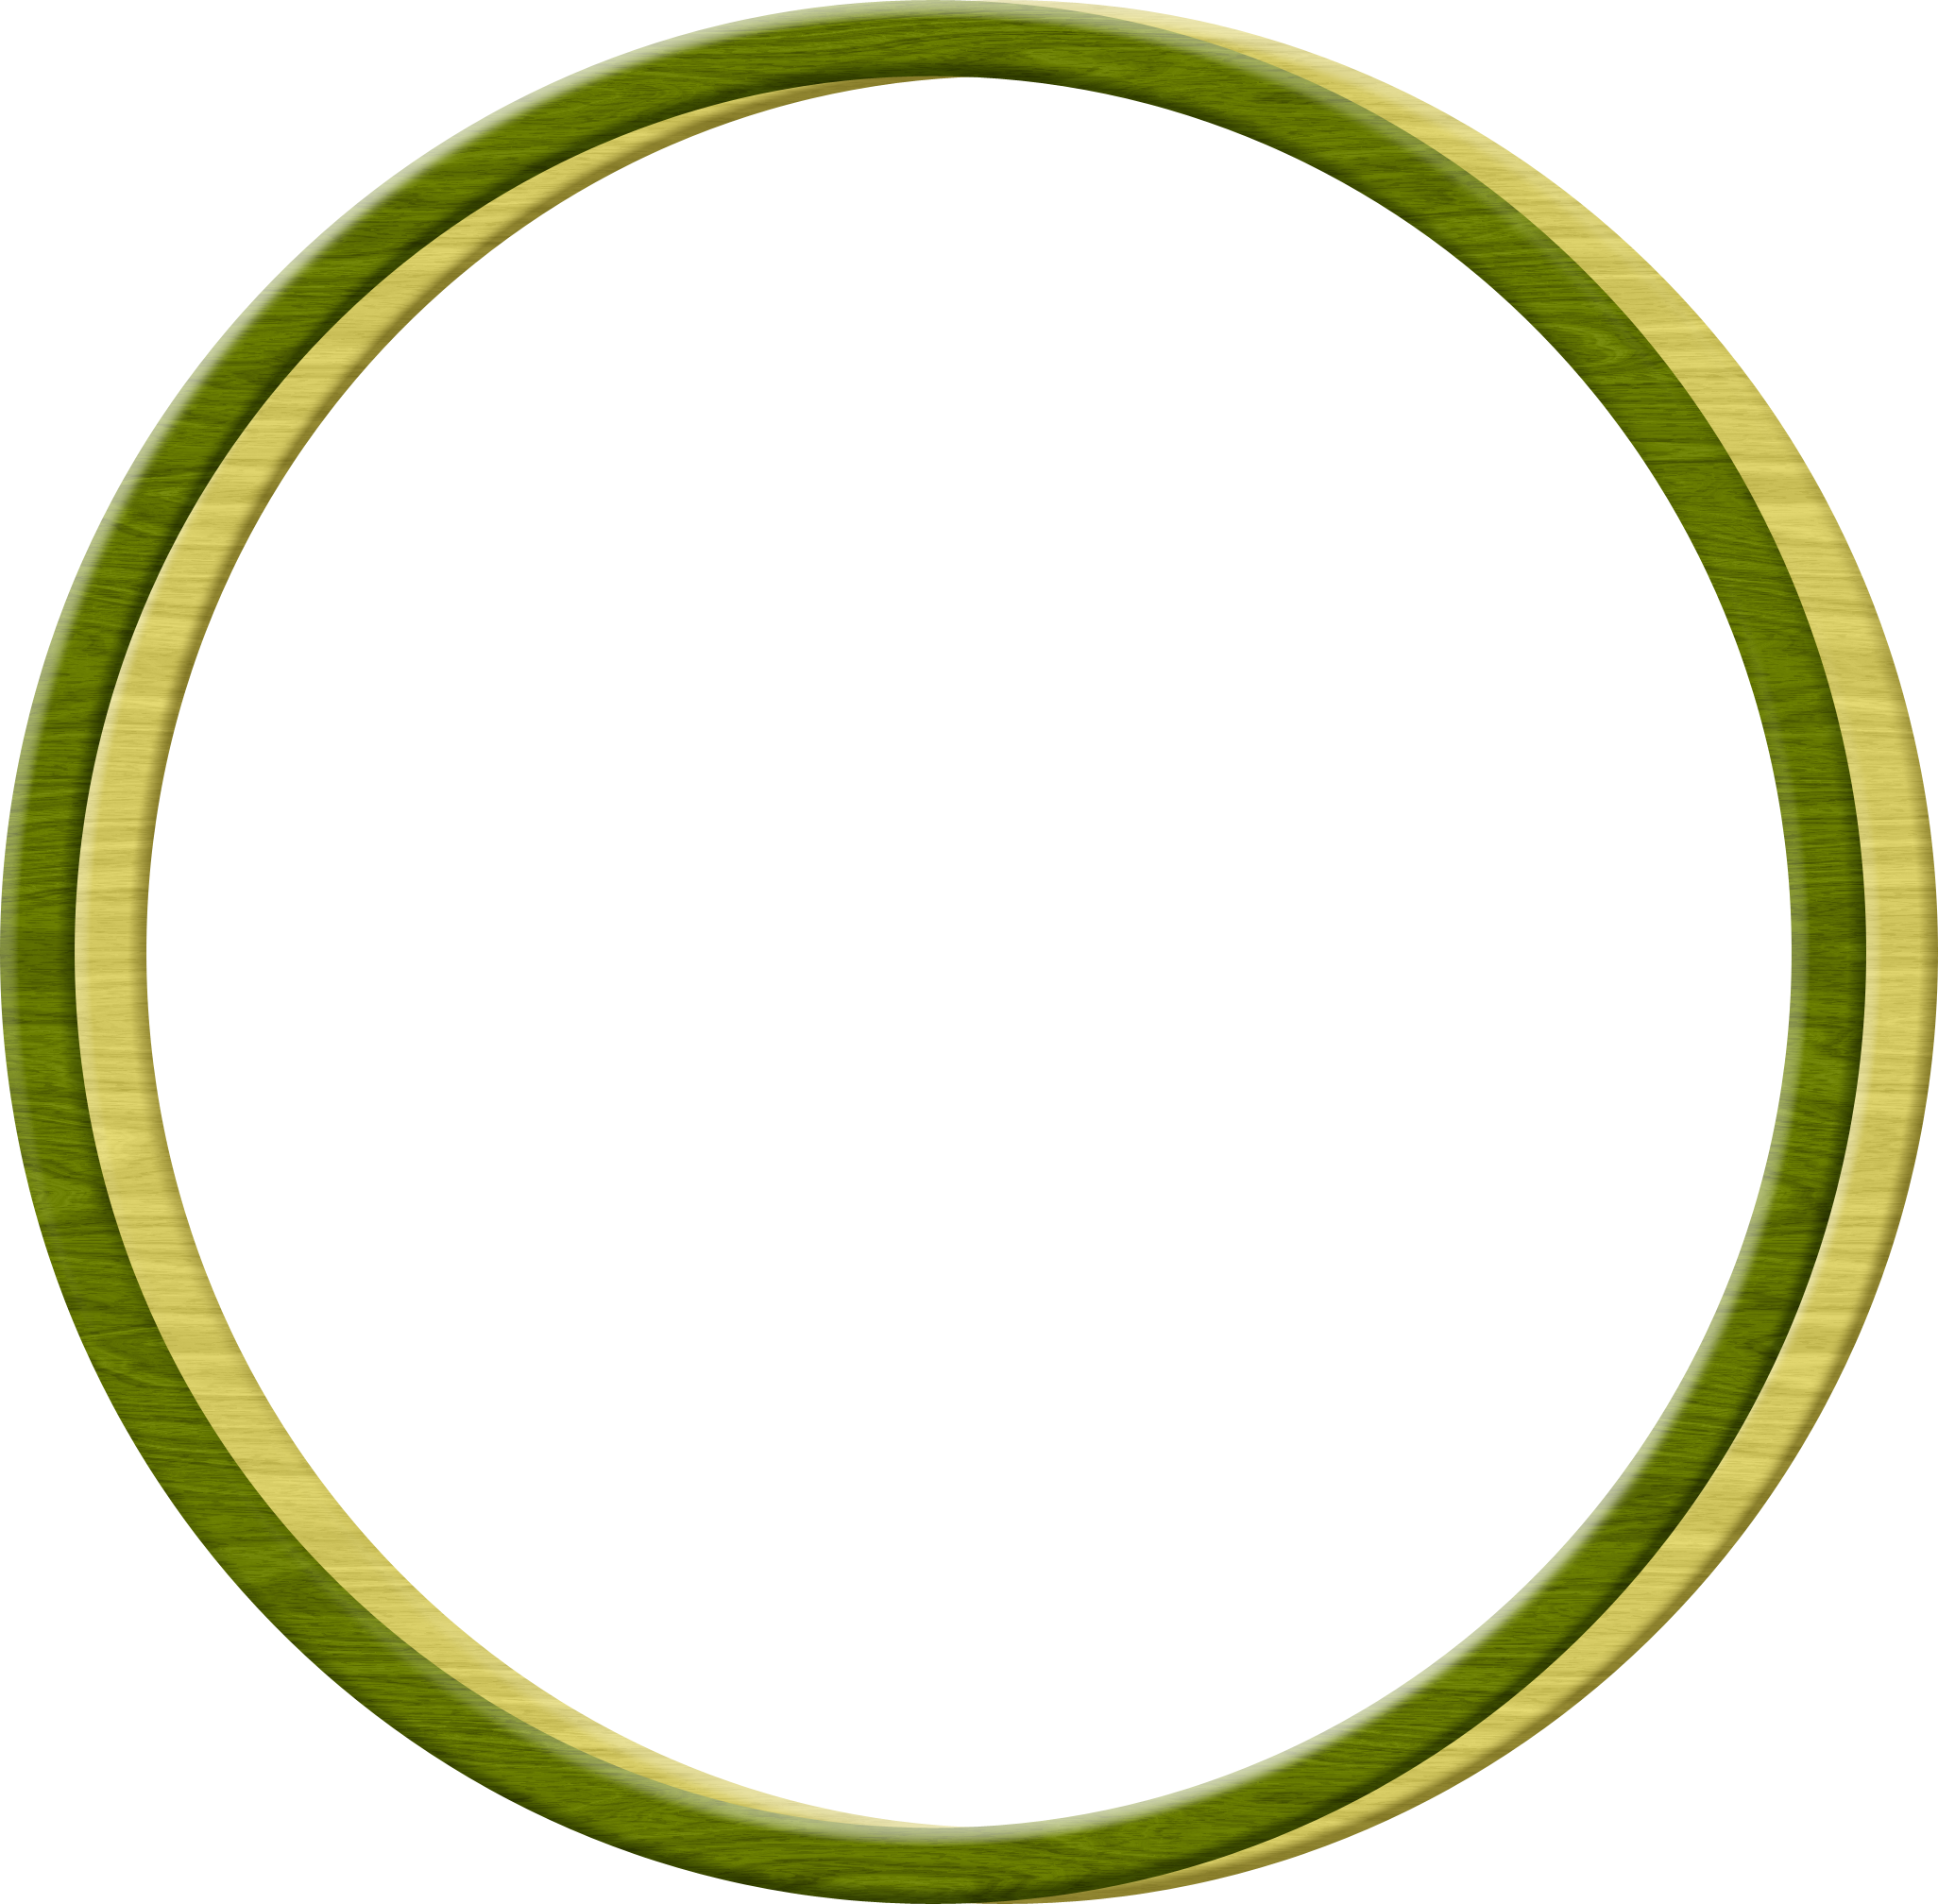 Рамки круглые - Кира-скрап - клипарт и ...: kira-scrap.ru/dir/ramki/ramki_kruglye_i_ovalnye/1/351-1-0-2715